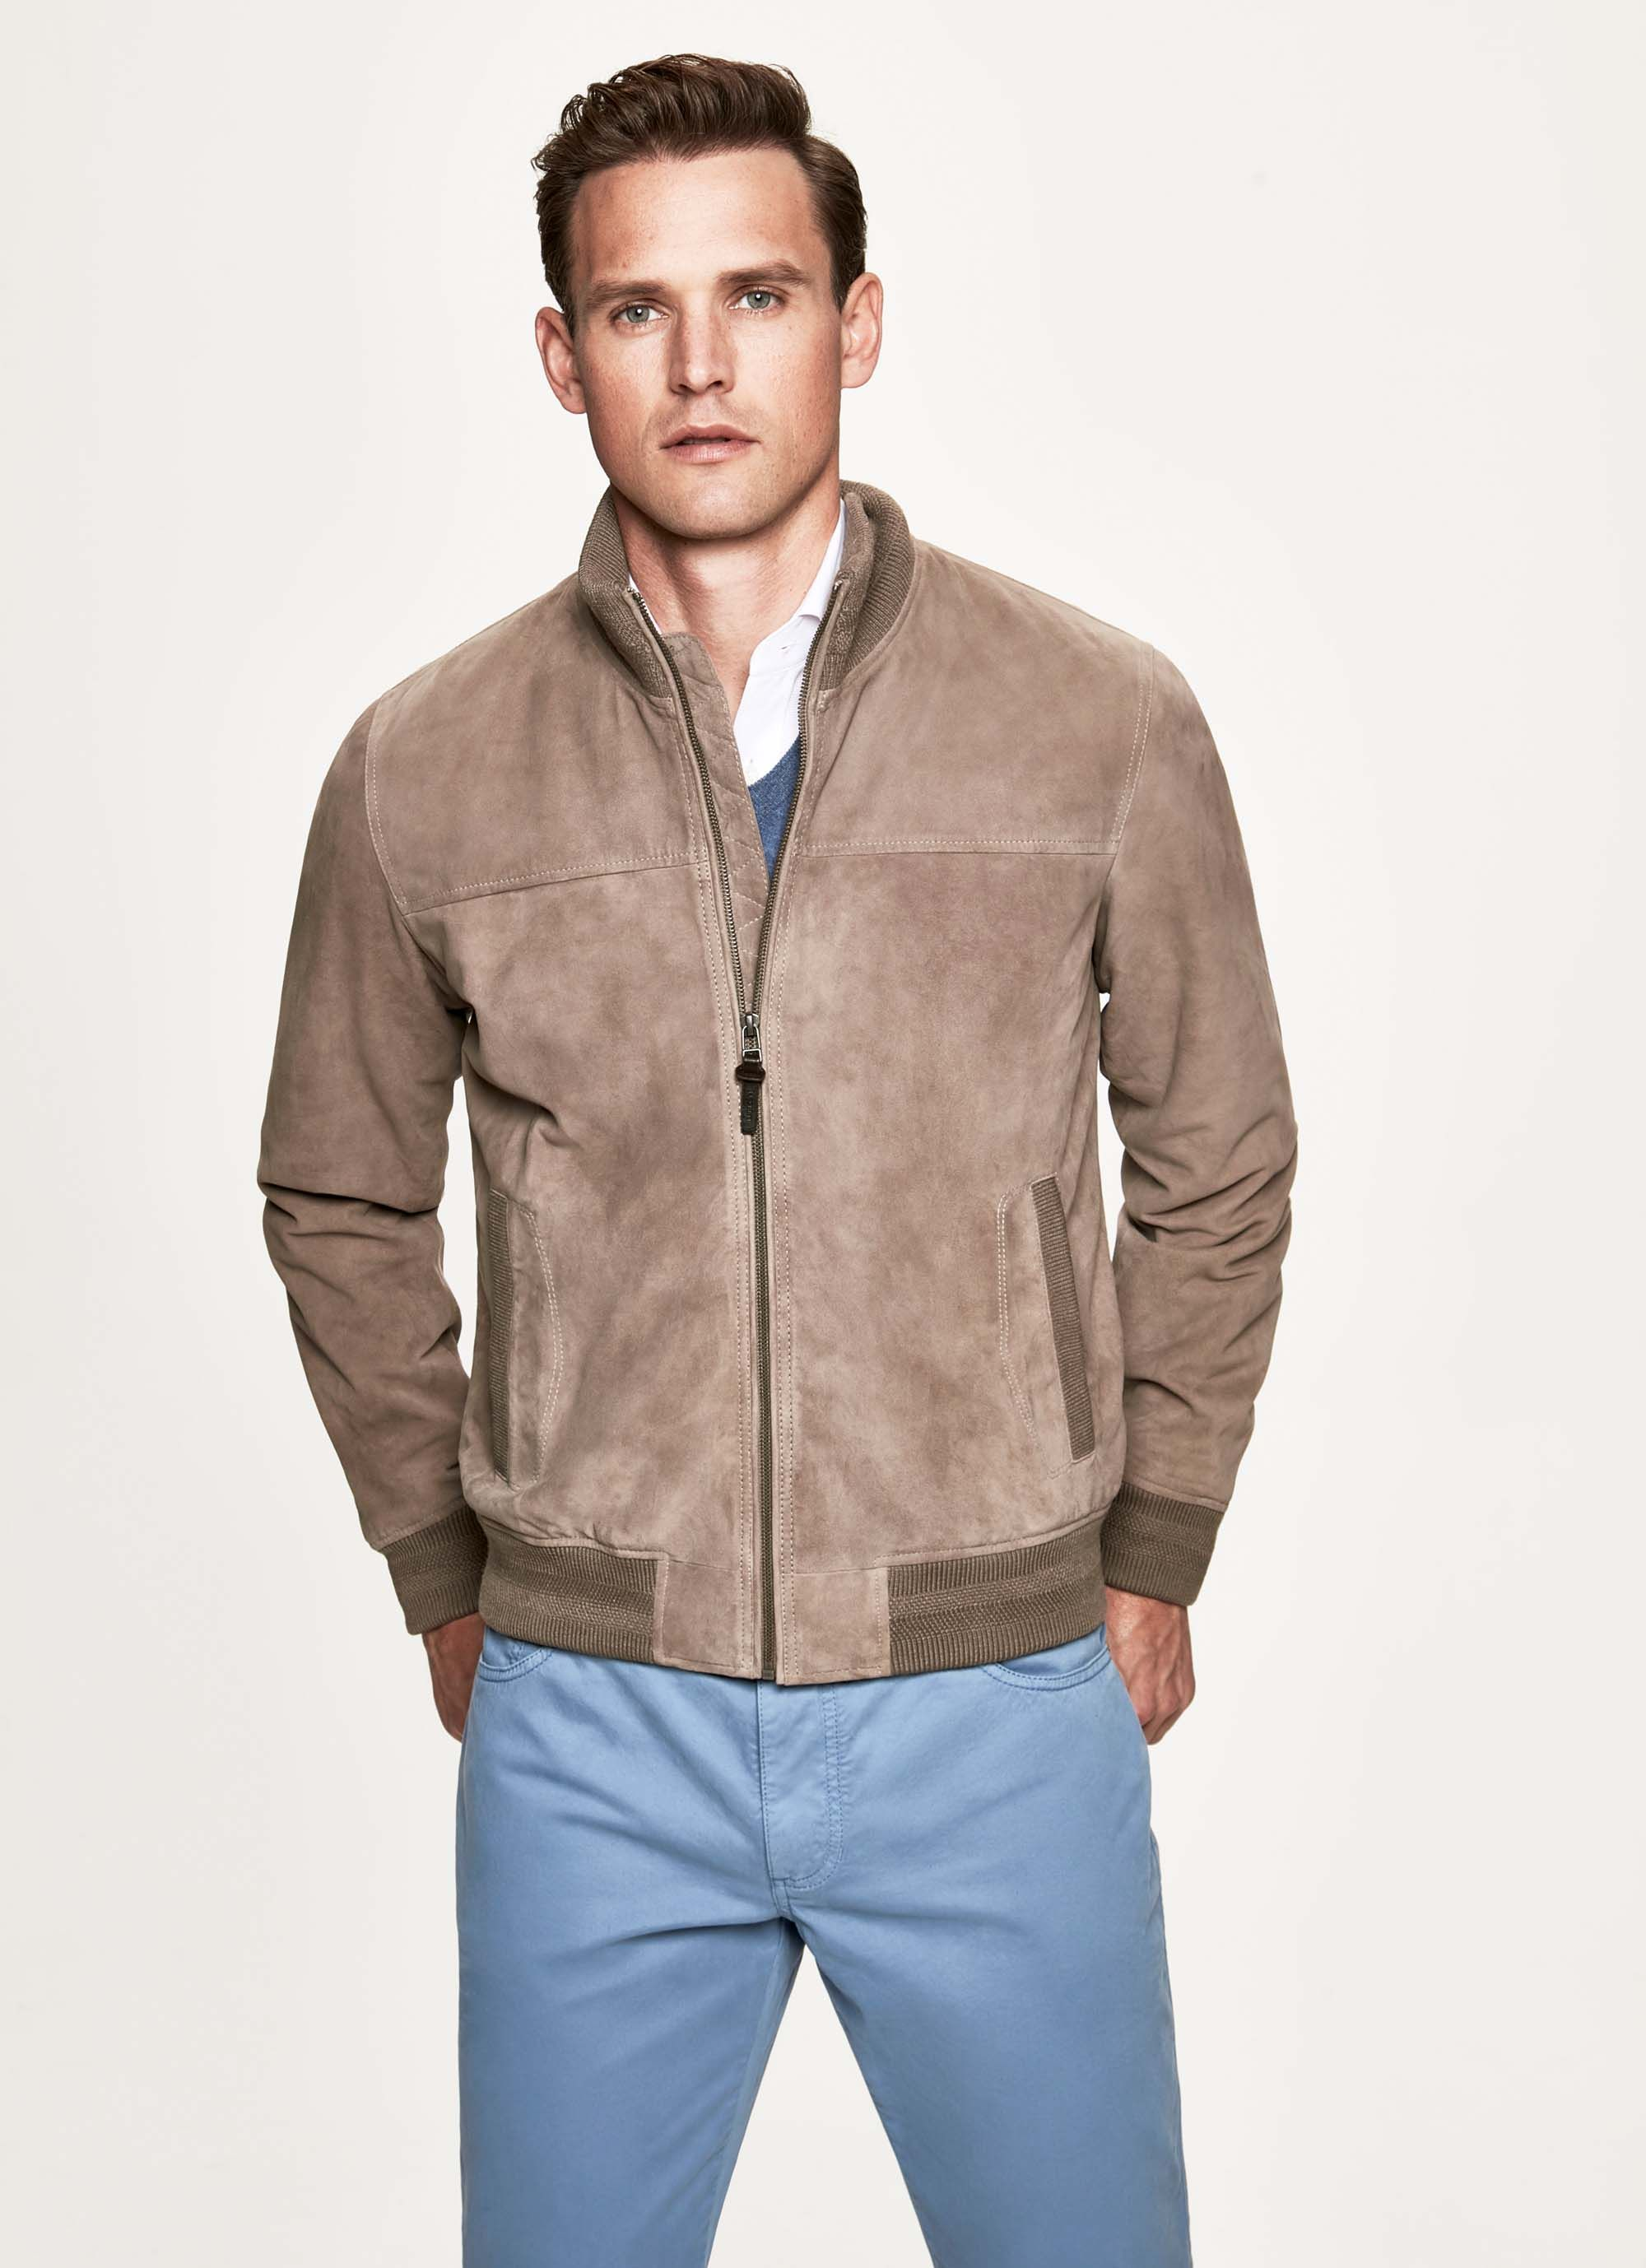 Hackett Suede Bomber Jacket Hackett Cloth Captain America Leather Jacket Jackets Suede Bomber Jacket [ 2756 x 2000 Pixel ]